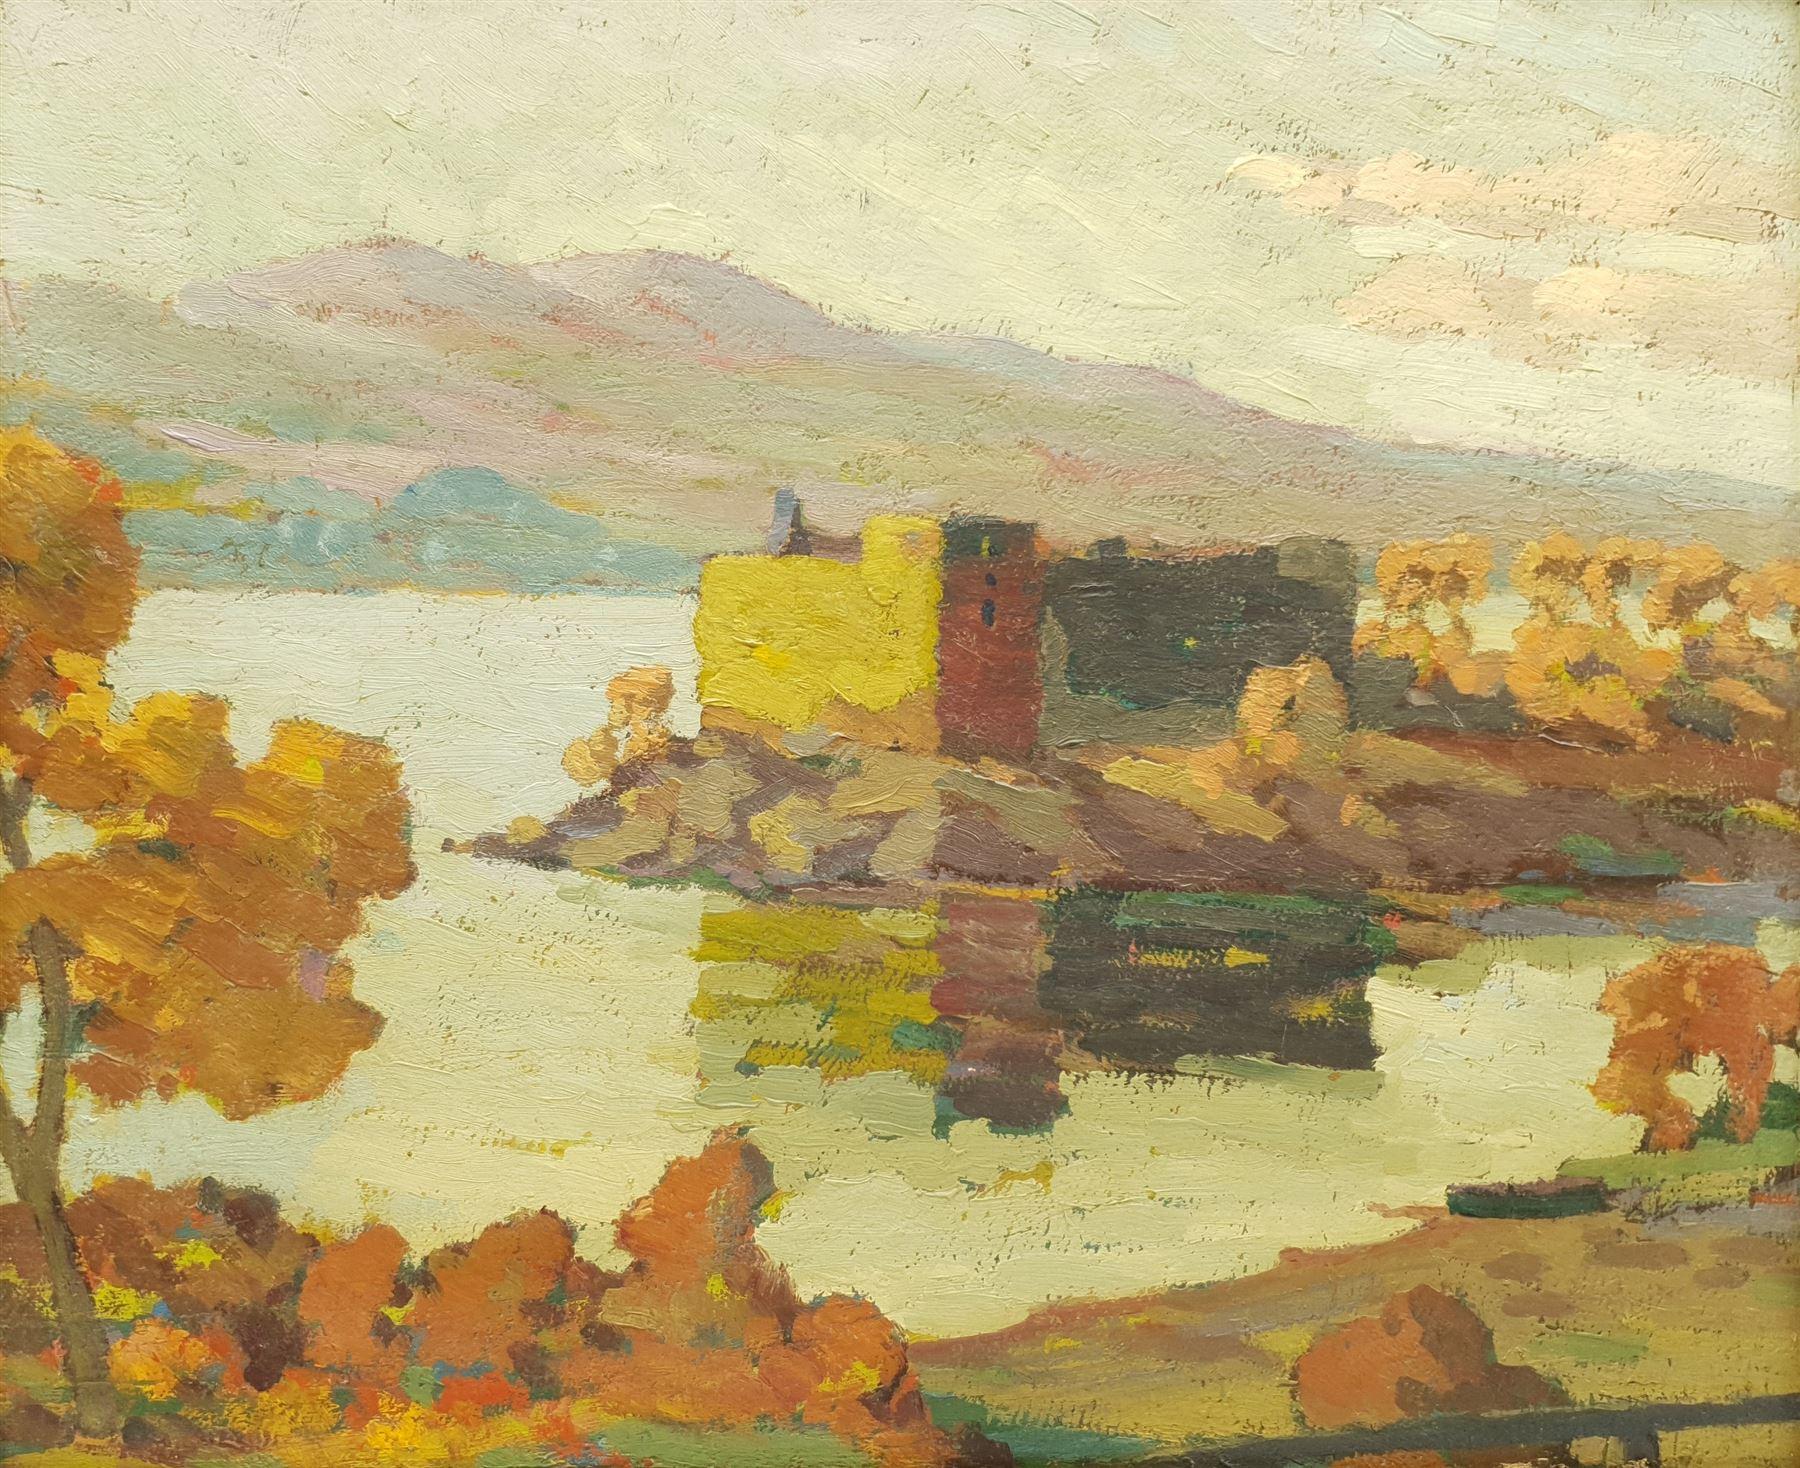 Scottish School (Early 20th century): Loch Scene with Peninsular Castle